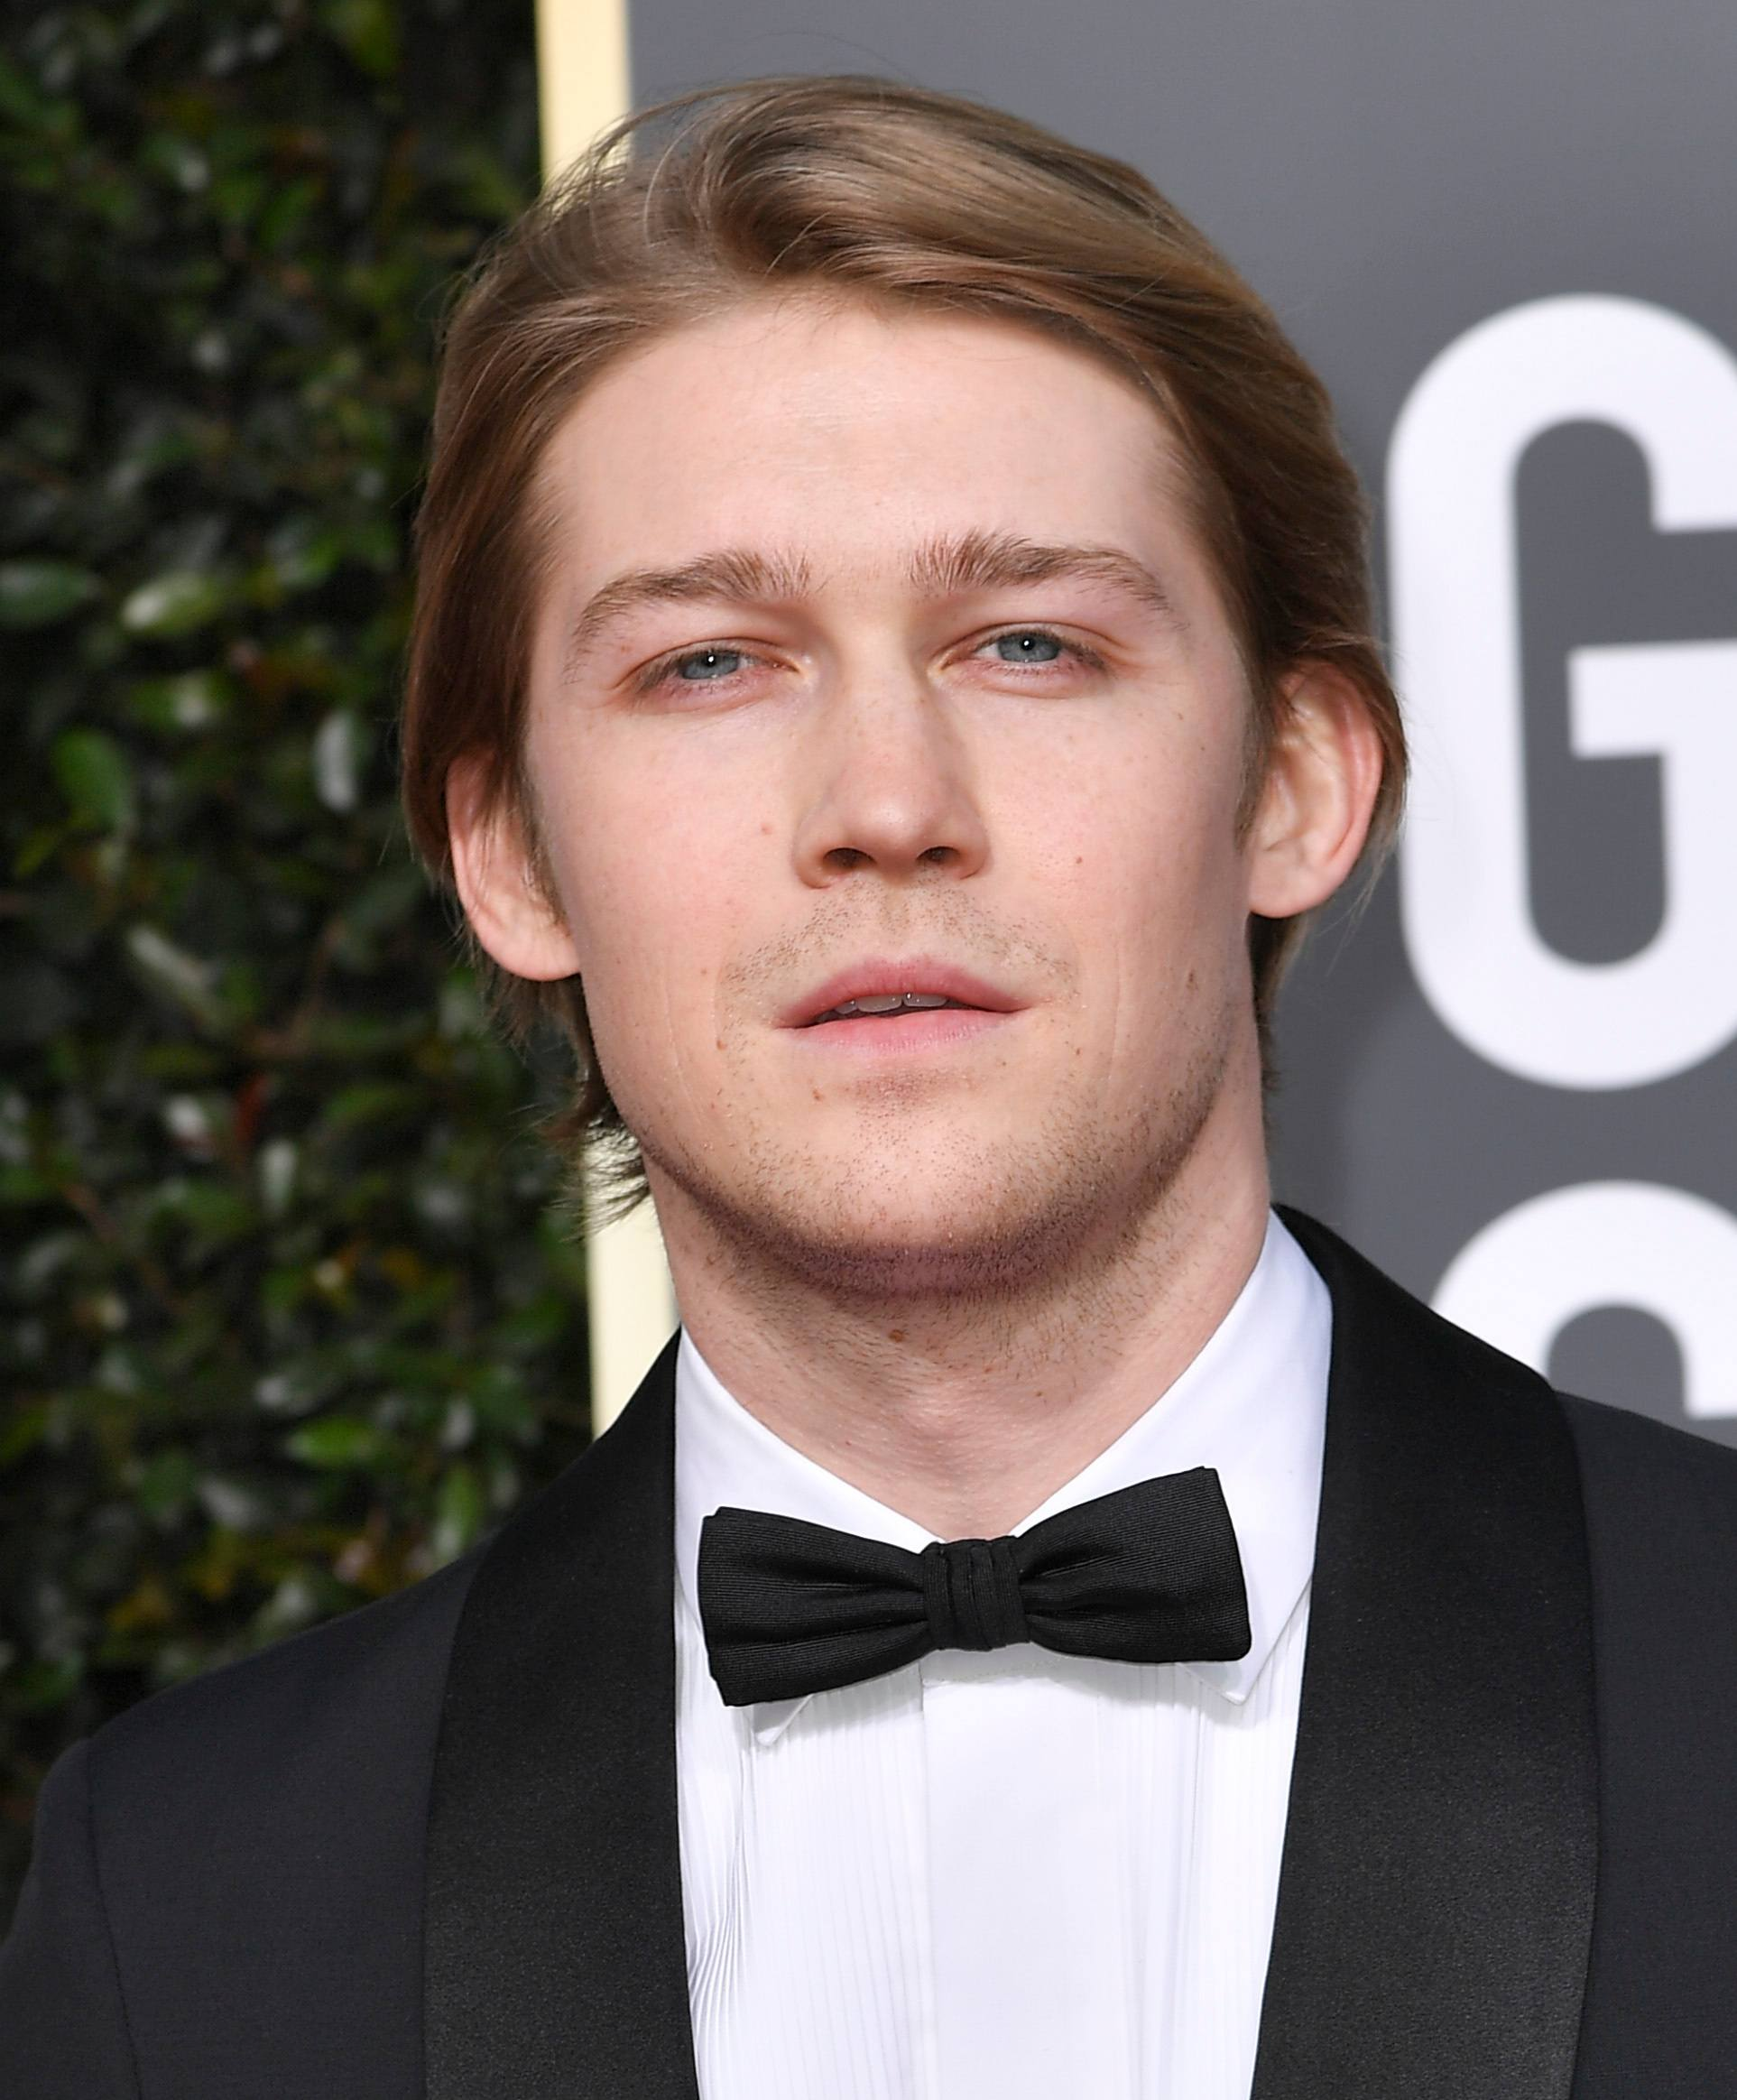 Golden Globes 2019: Close-up of Joe Alwyn with dark blonde medium length hair tucked behind his ears